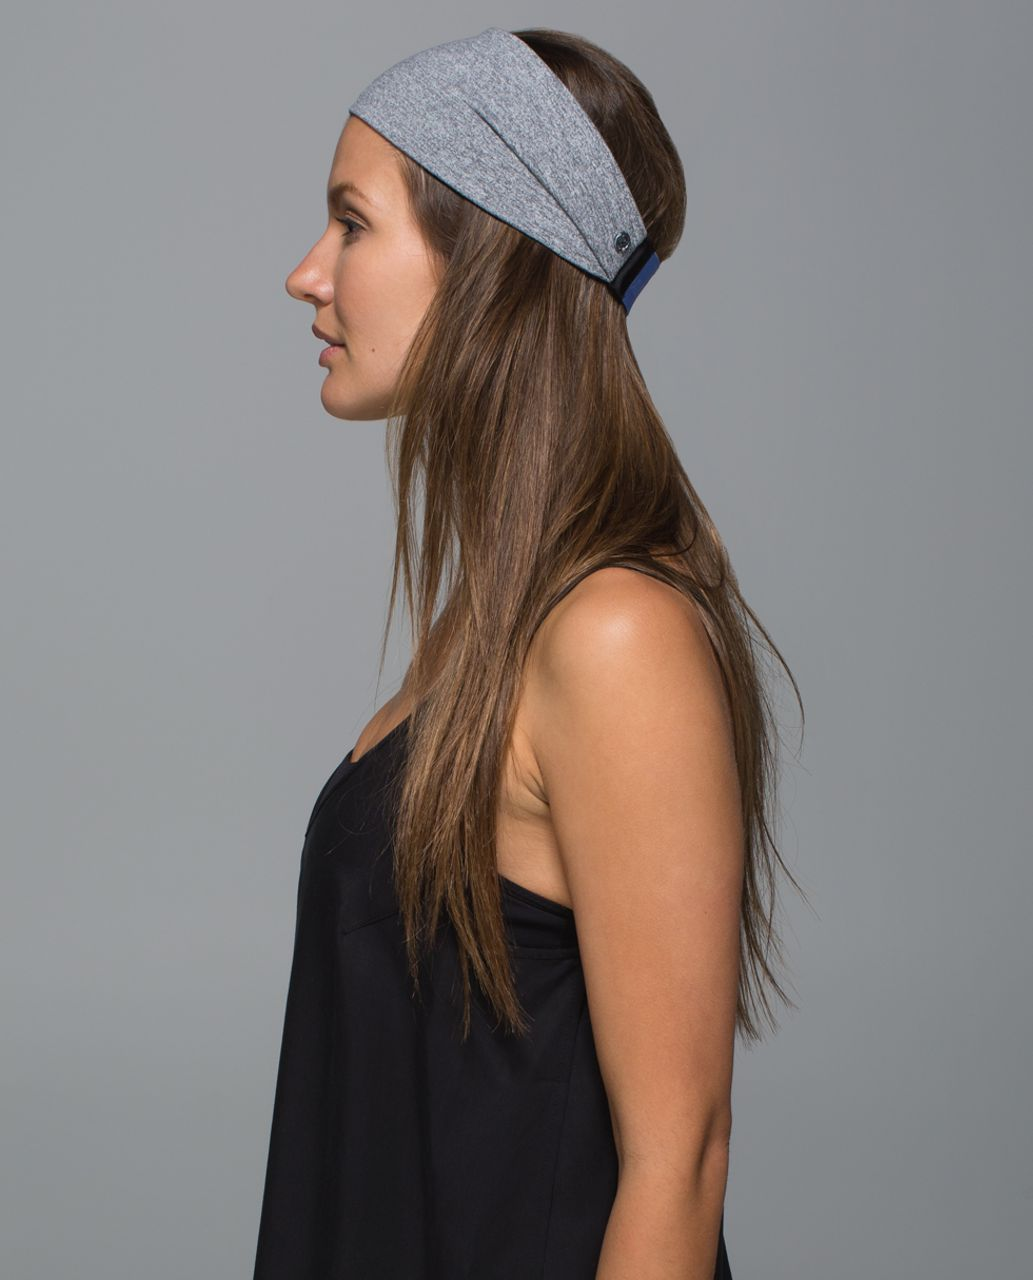 Lululemon Fringe Fighter Headband - Heathered Slate / Lullaby